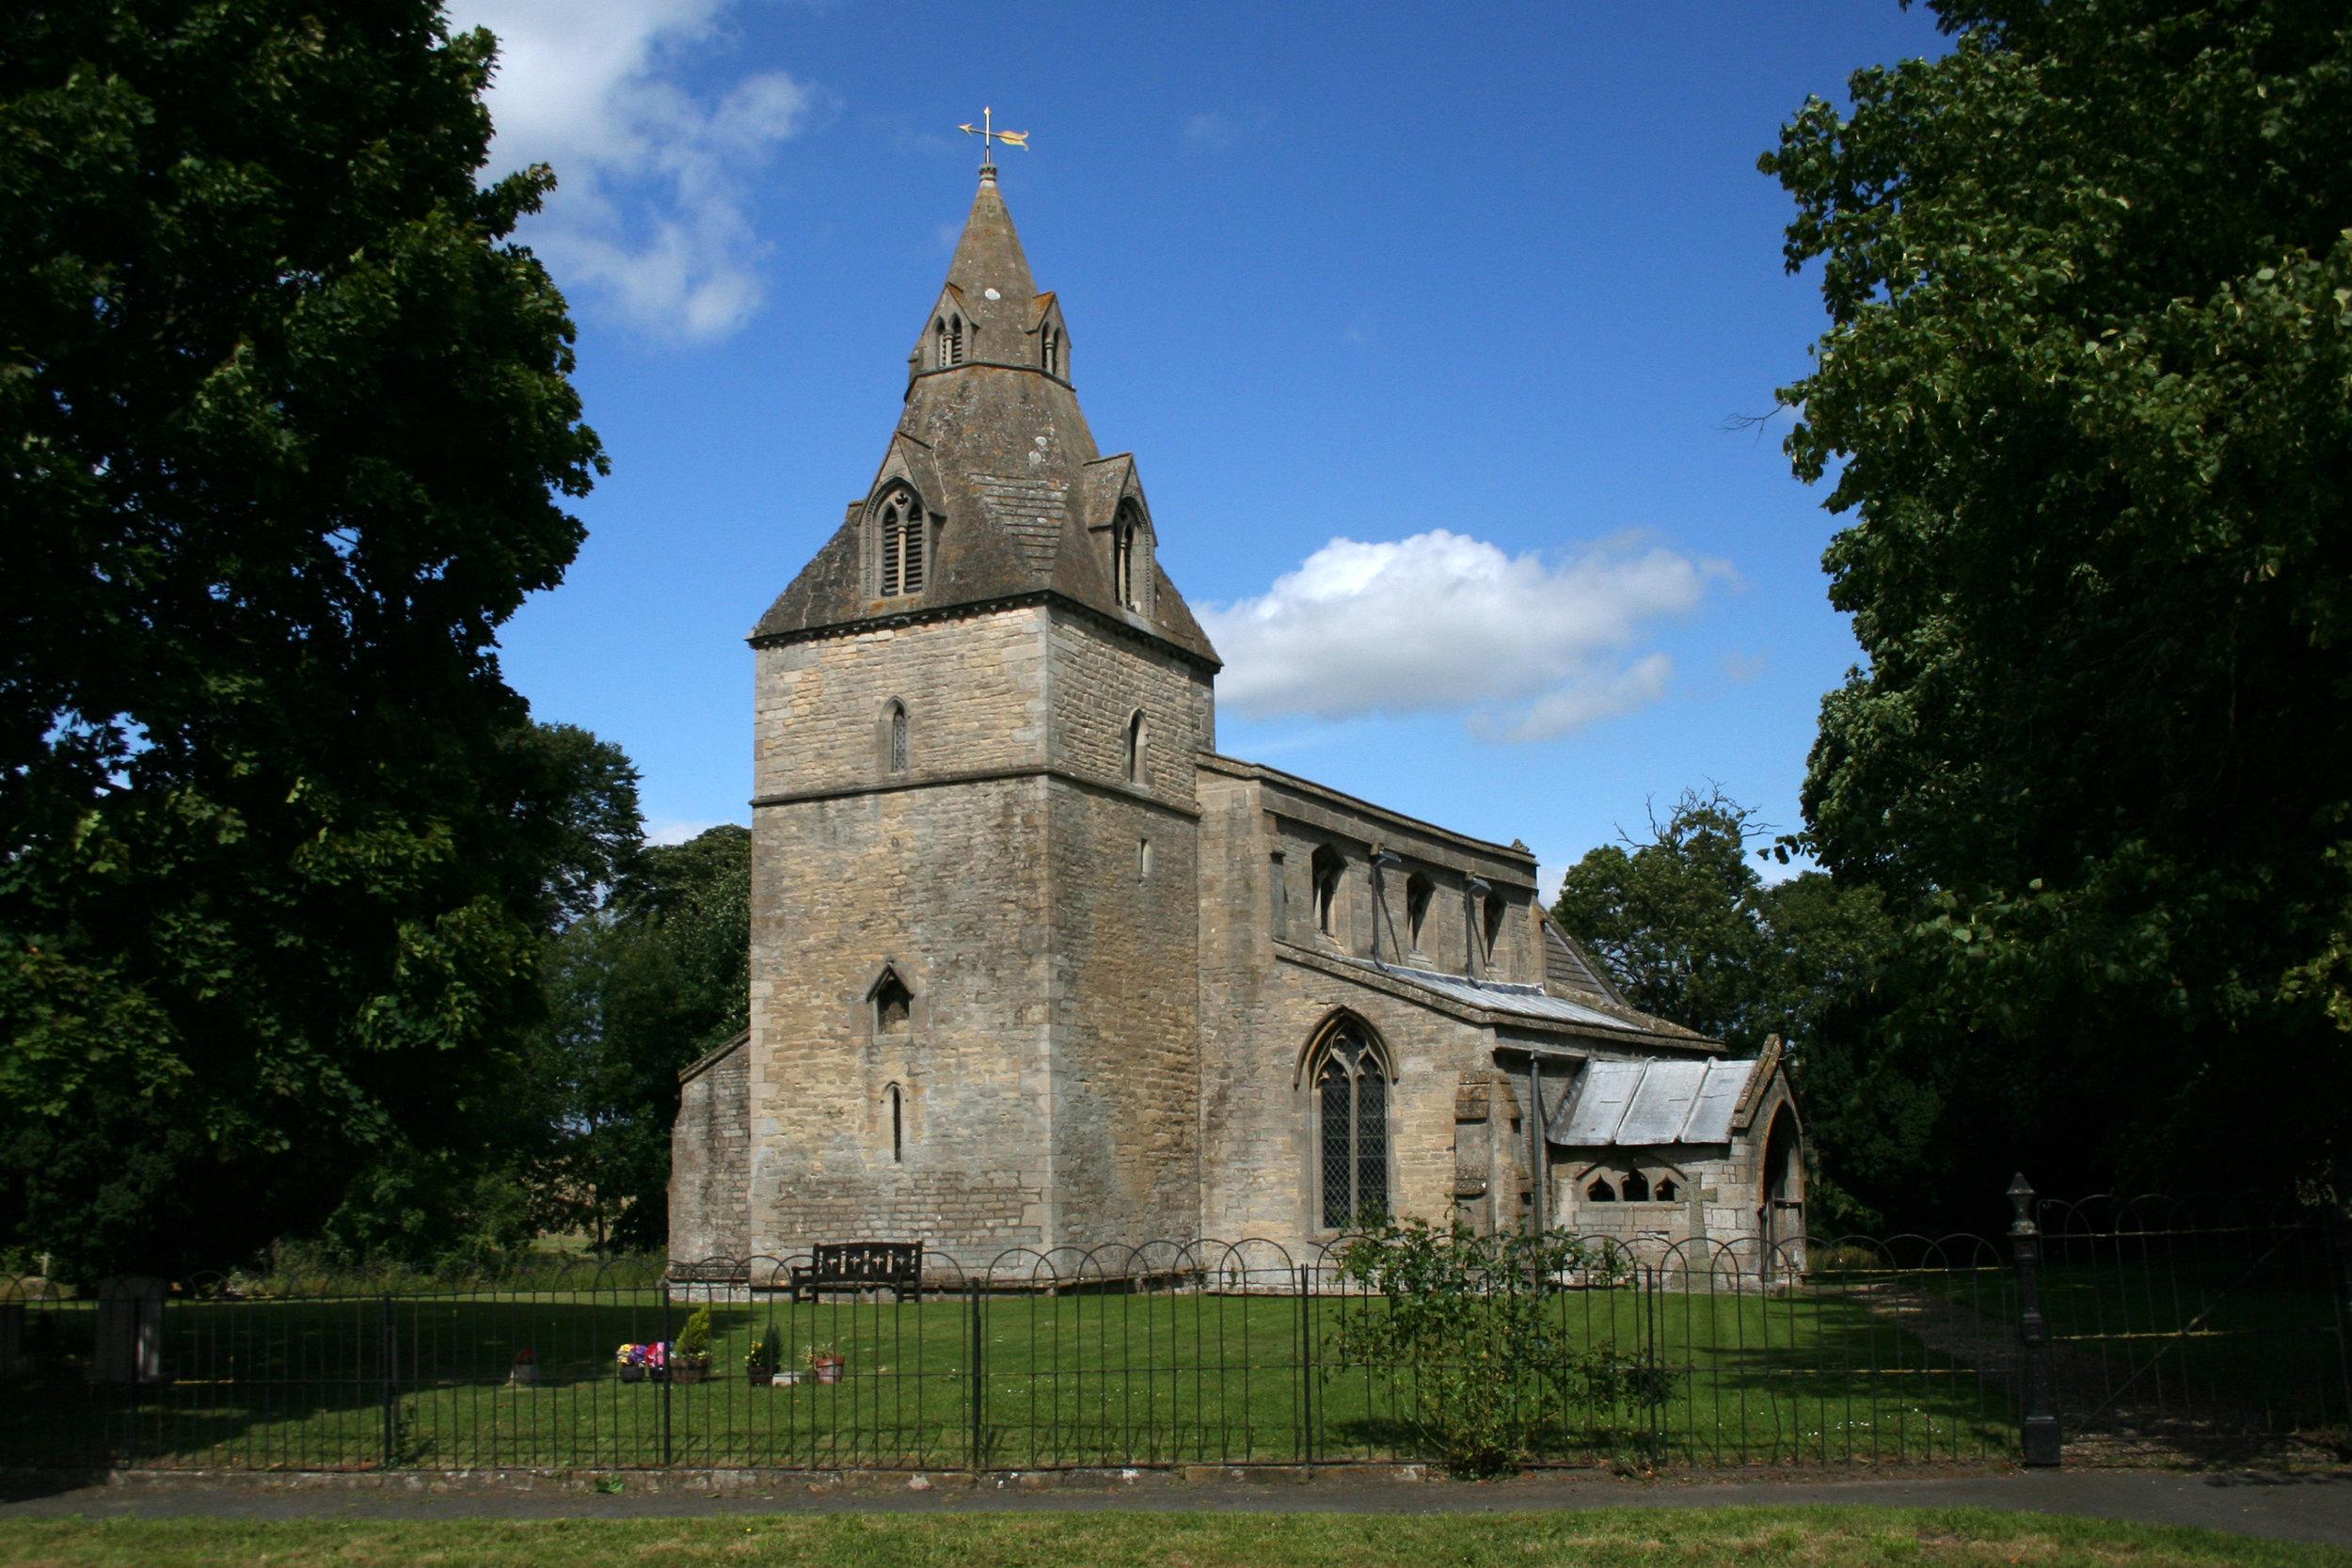 St Thomas's Church, Burton-le-Coggles